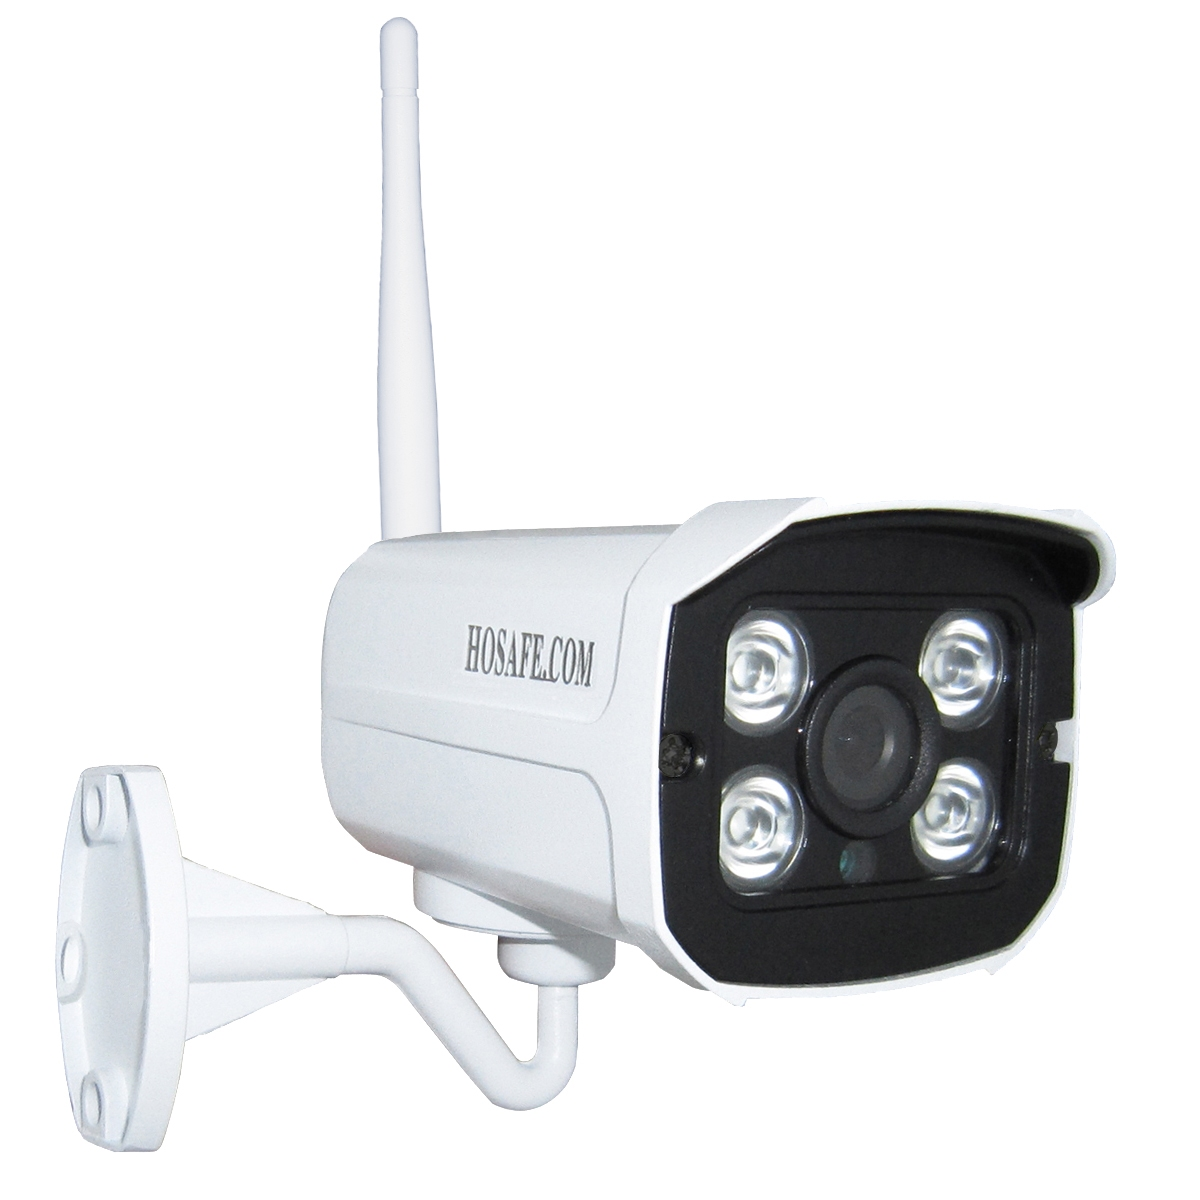 HOSAFECOM Стандарт США hd 1080p indoor poe dome ip camera vandal proof onvif infrared cctv surveillance security cmos night vision webcam freeshipping